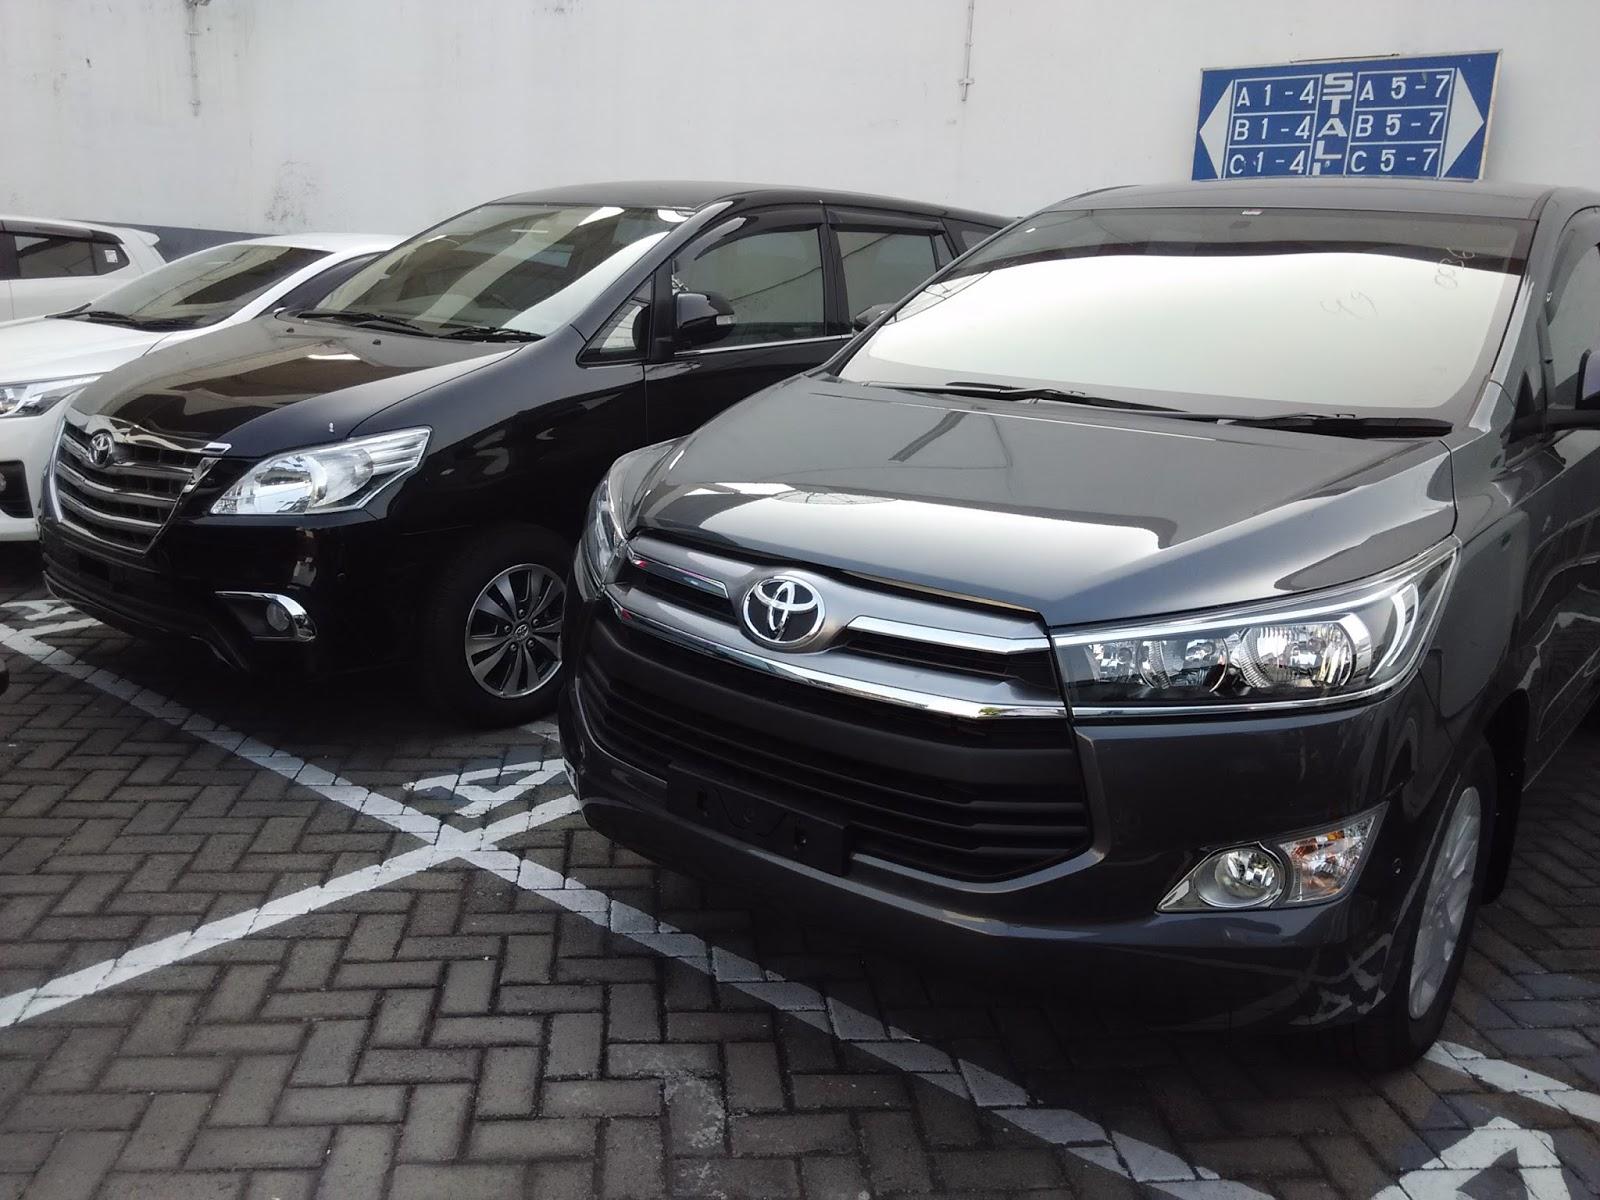 Harga All New Innova Venturer Grand Avanza E Mt Melihat Interior Tipe V Dikta Toyota